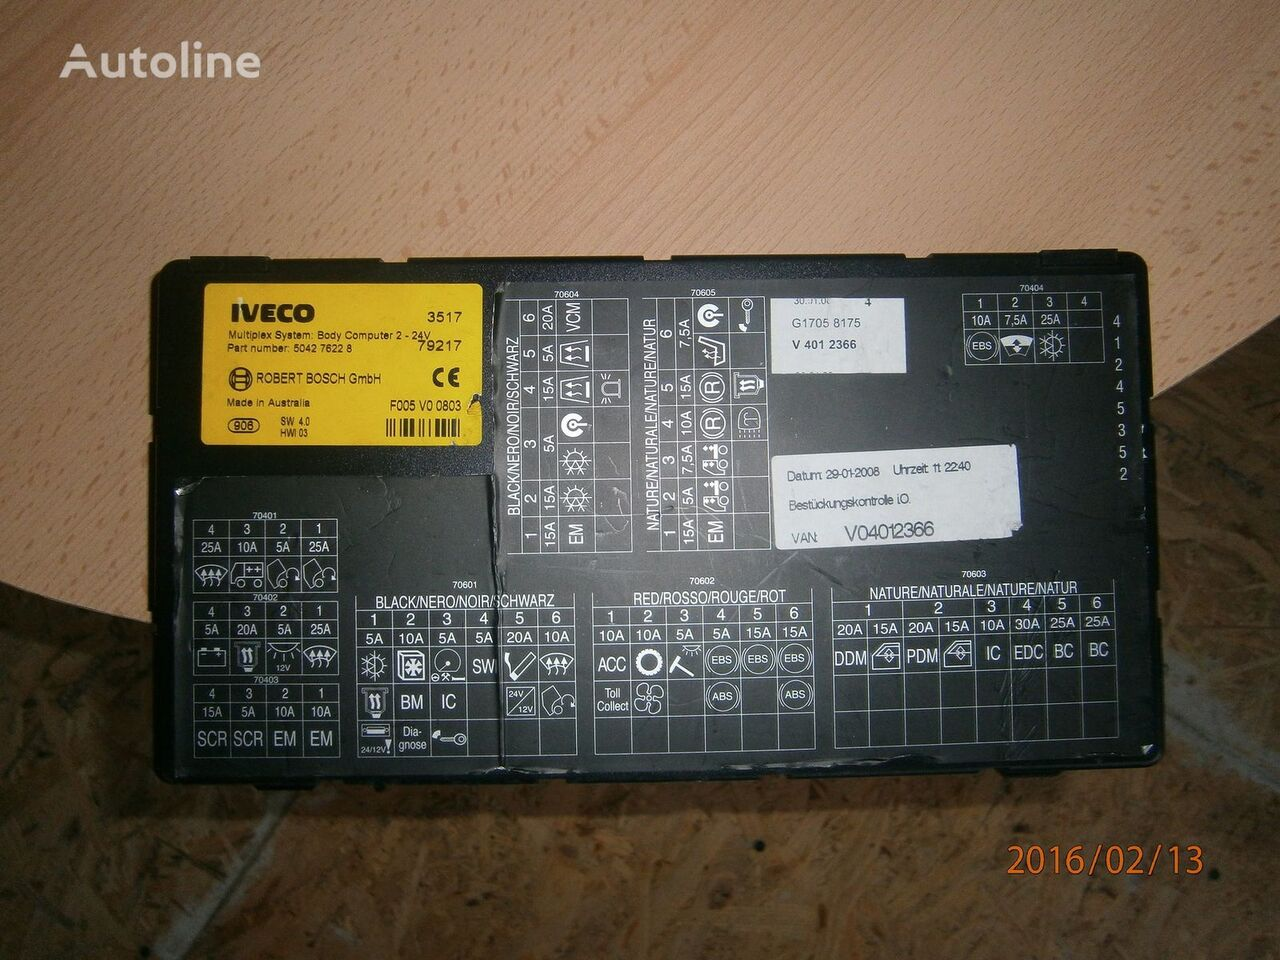 IVECO EURO5 Multiplex system body computer 504276228 styreenhet for IVECO Stralis trekkvogn